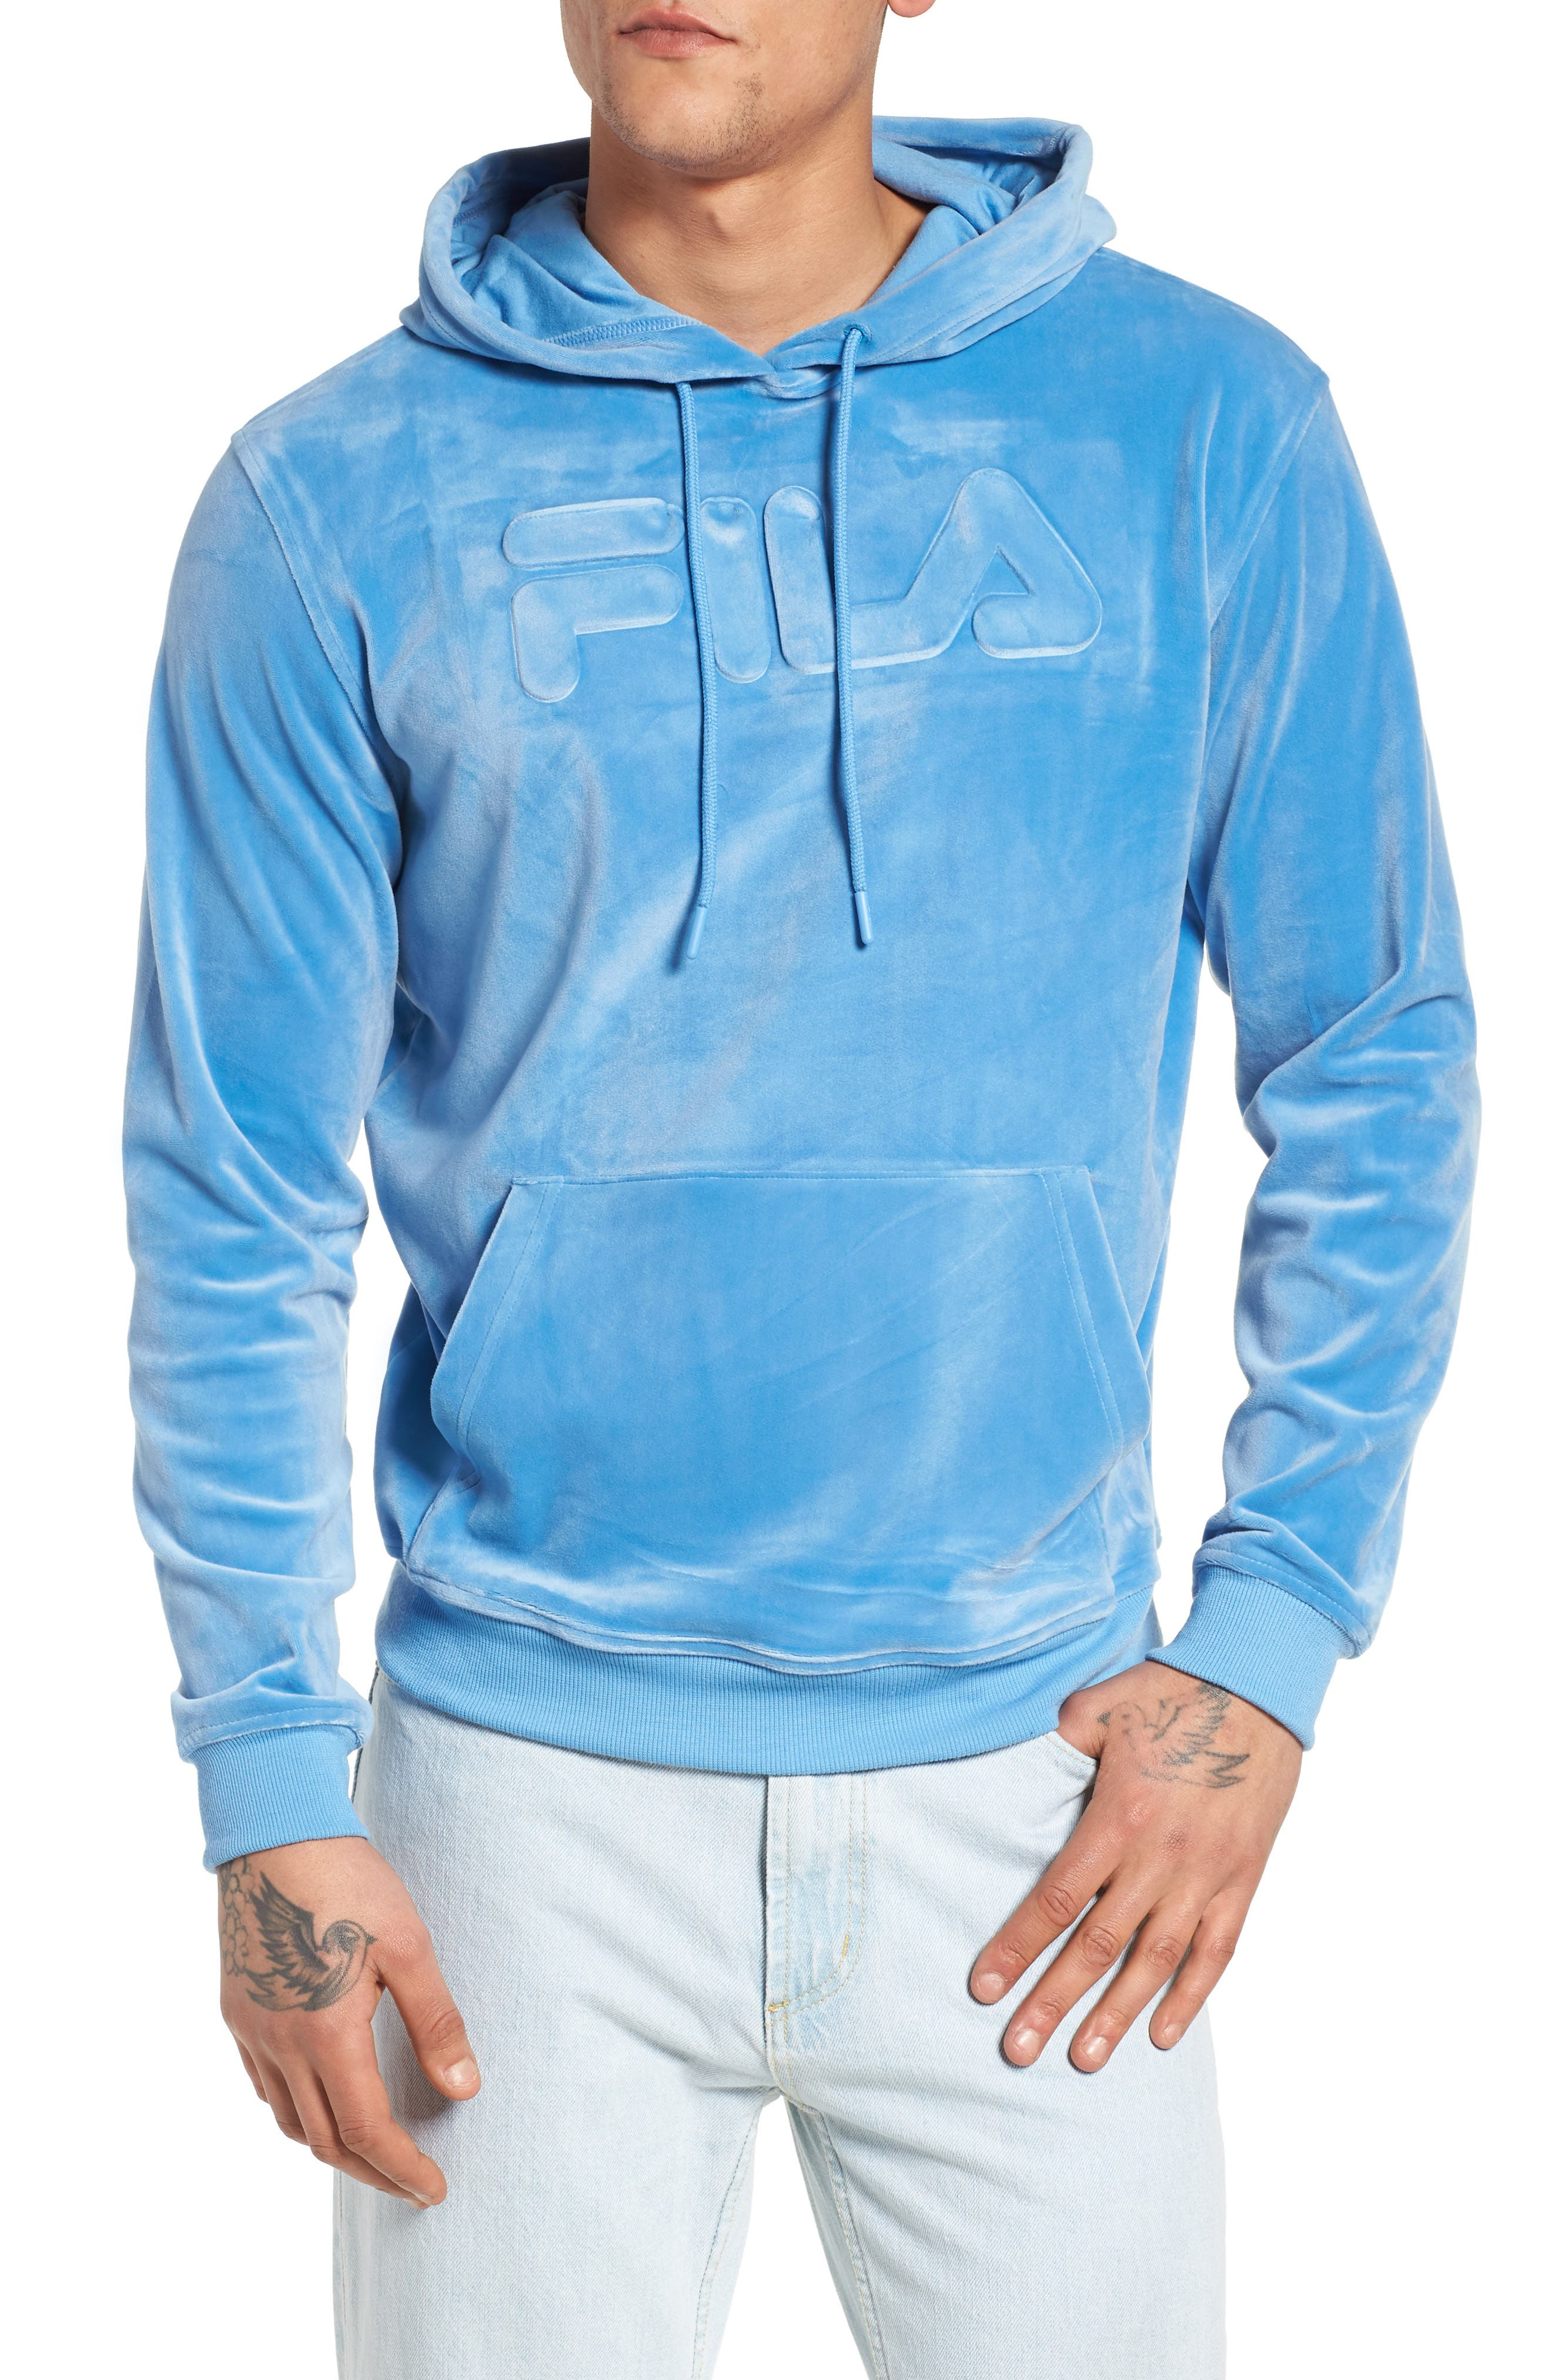 Asher Velour Hoodie Sweatshirt,                         Main,                         color, Silver Lake Blue